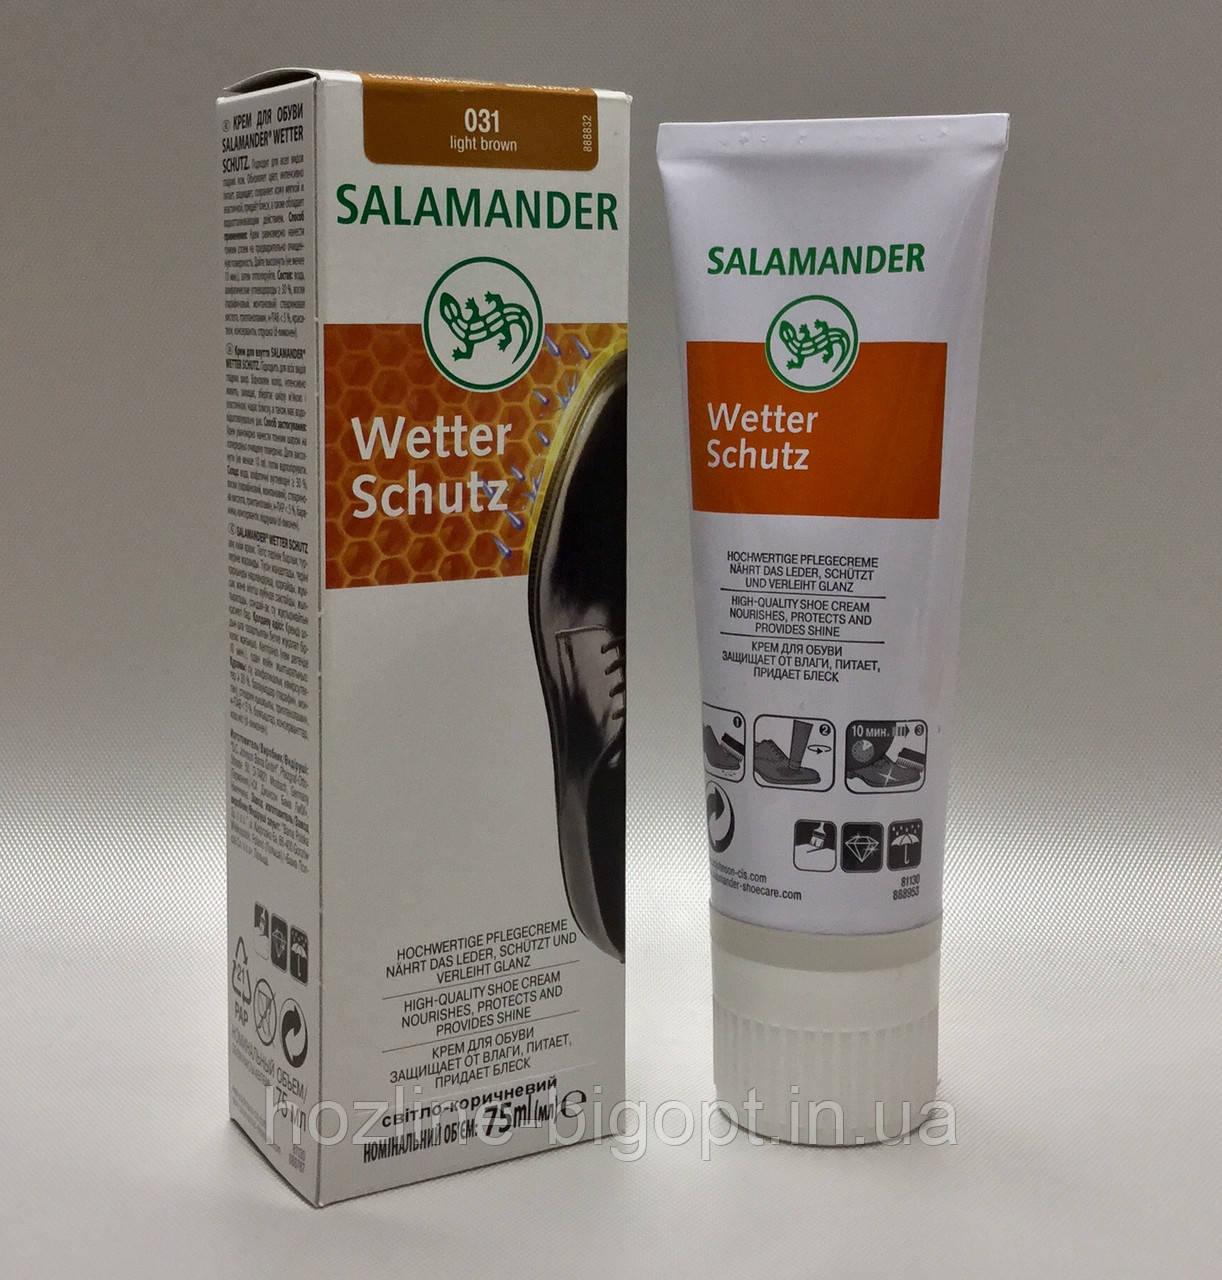 SALAMANDER крем для взуття 75мл СВІТЛО-КОРИЧНЕВИЙ 0113/031